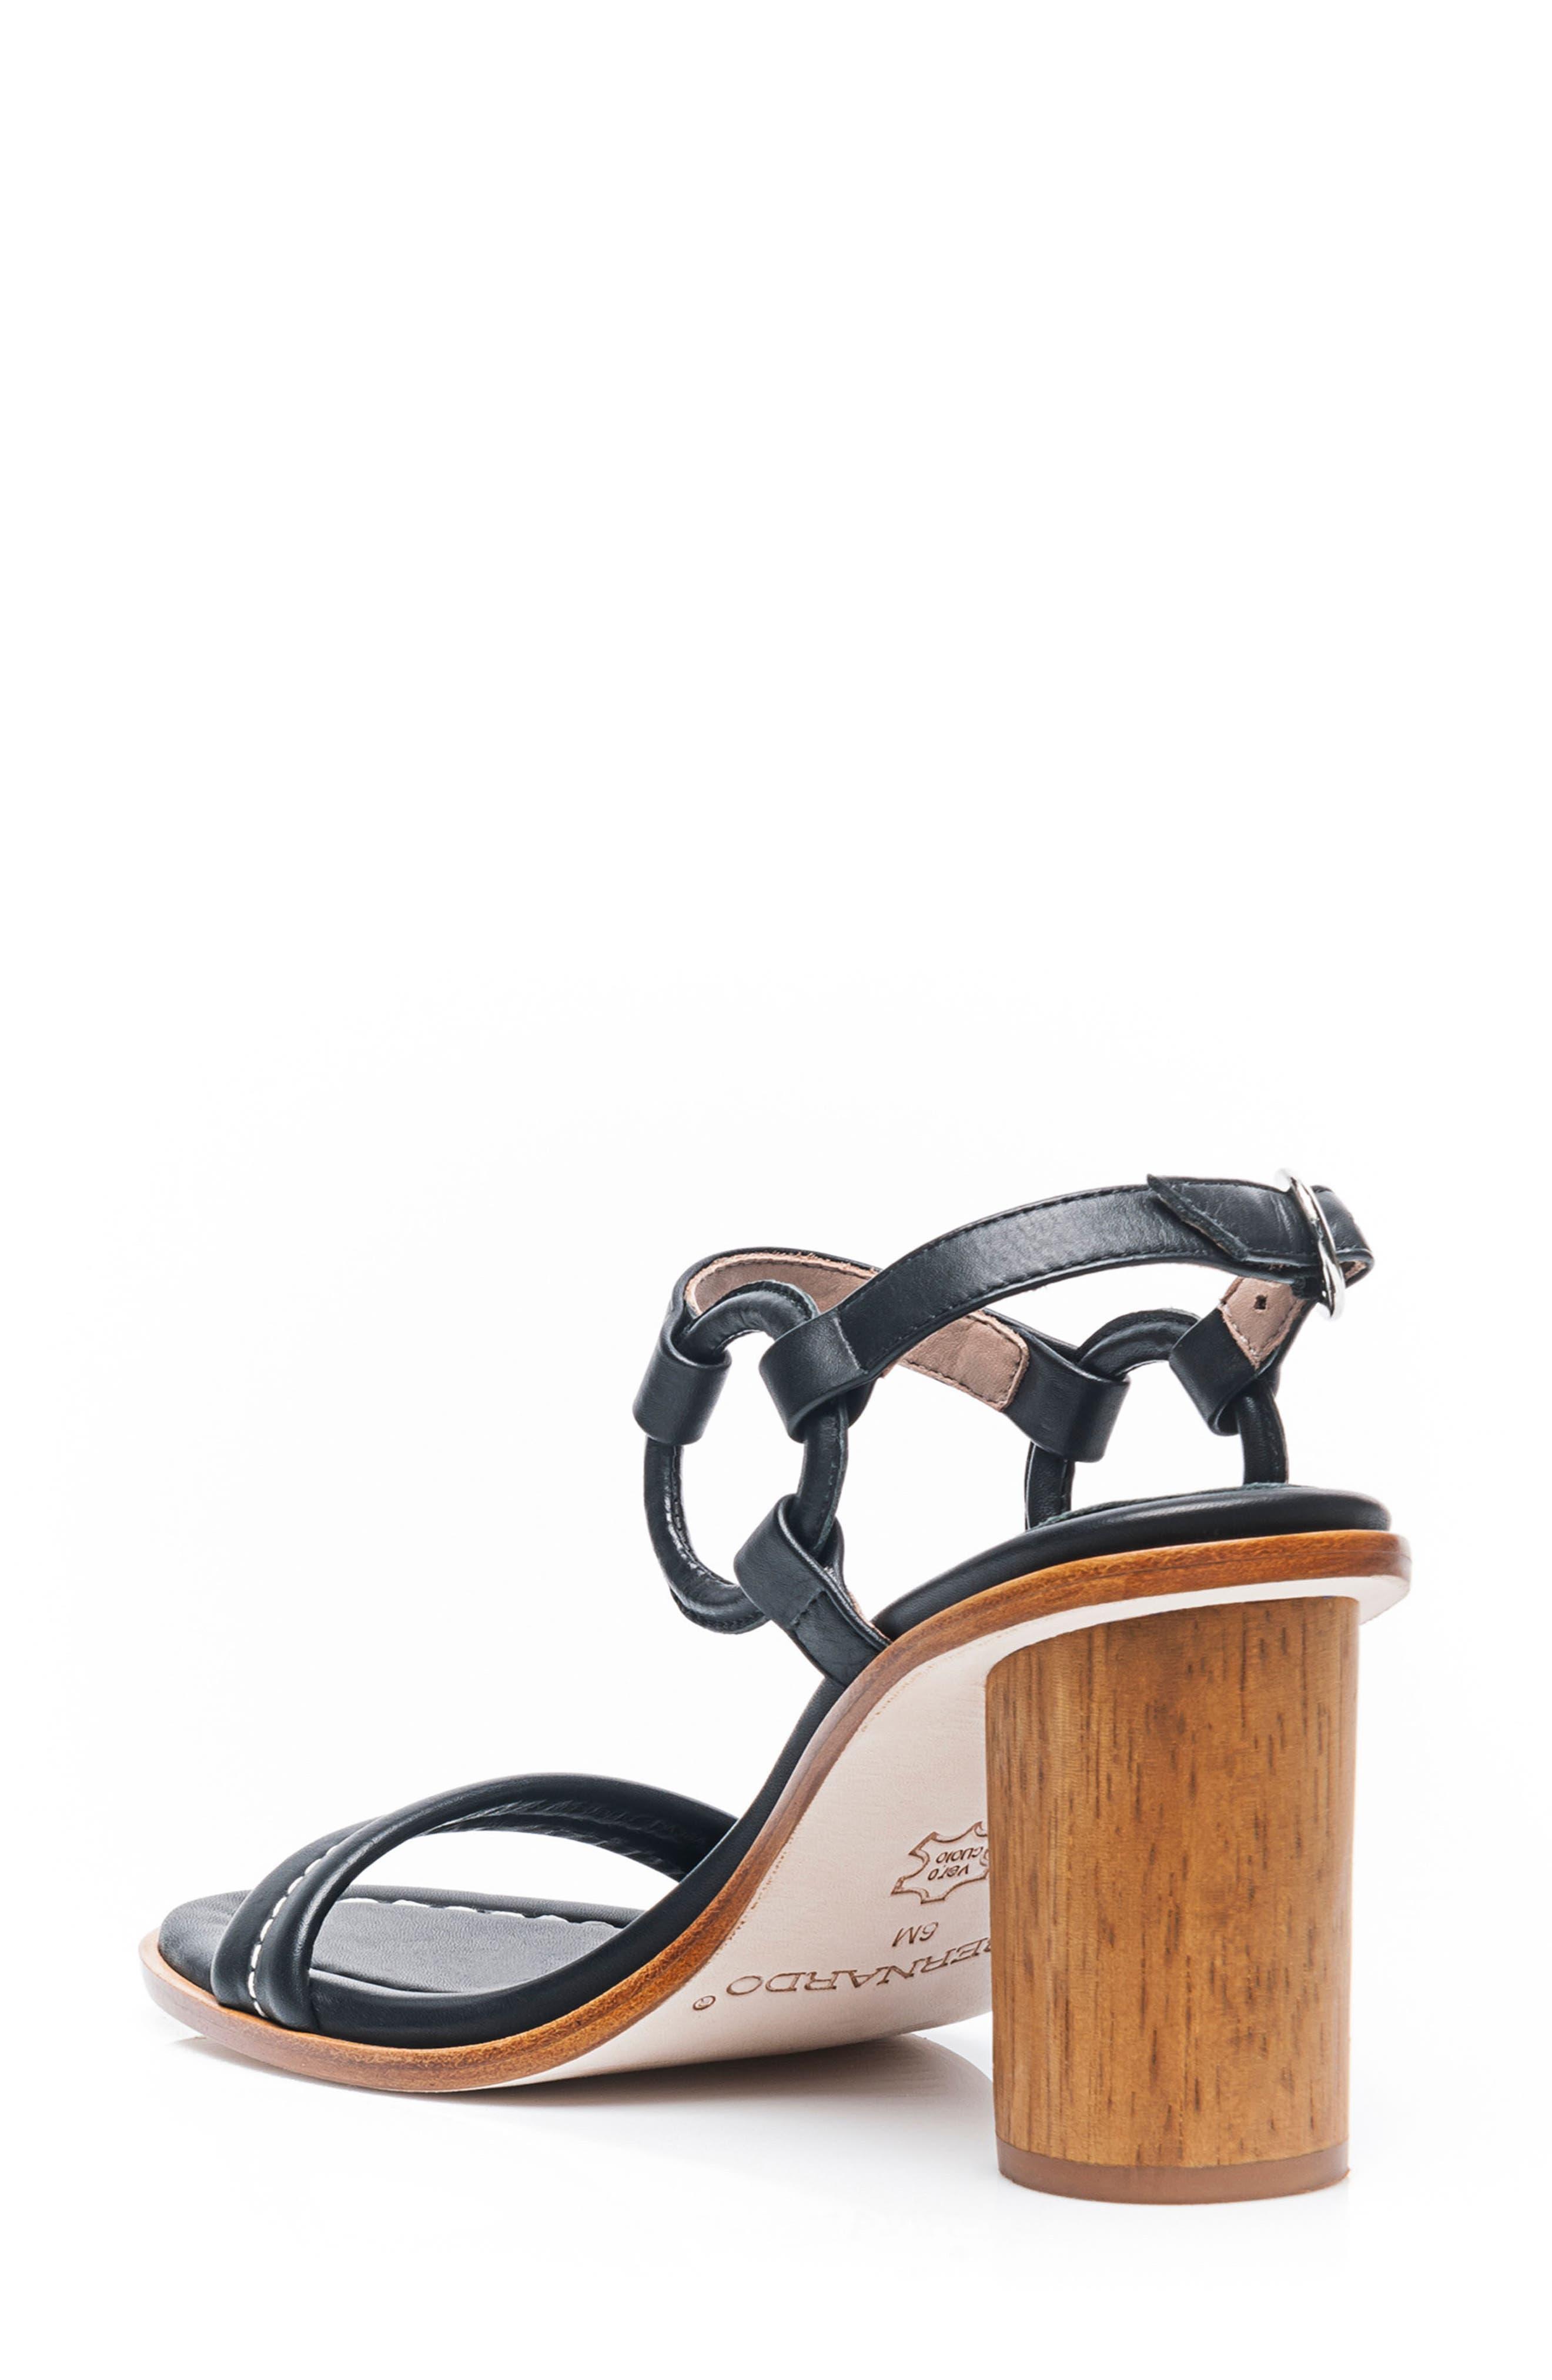 BERNARDO, Harlow Ankle Strap Sandal, Alternate thumbnail 2, color, BLACK LEATHER